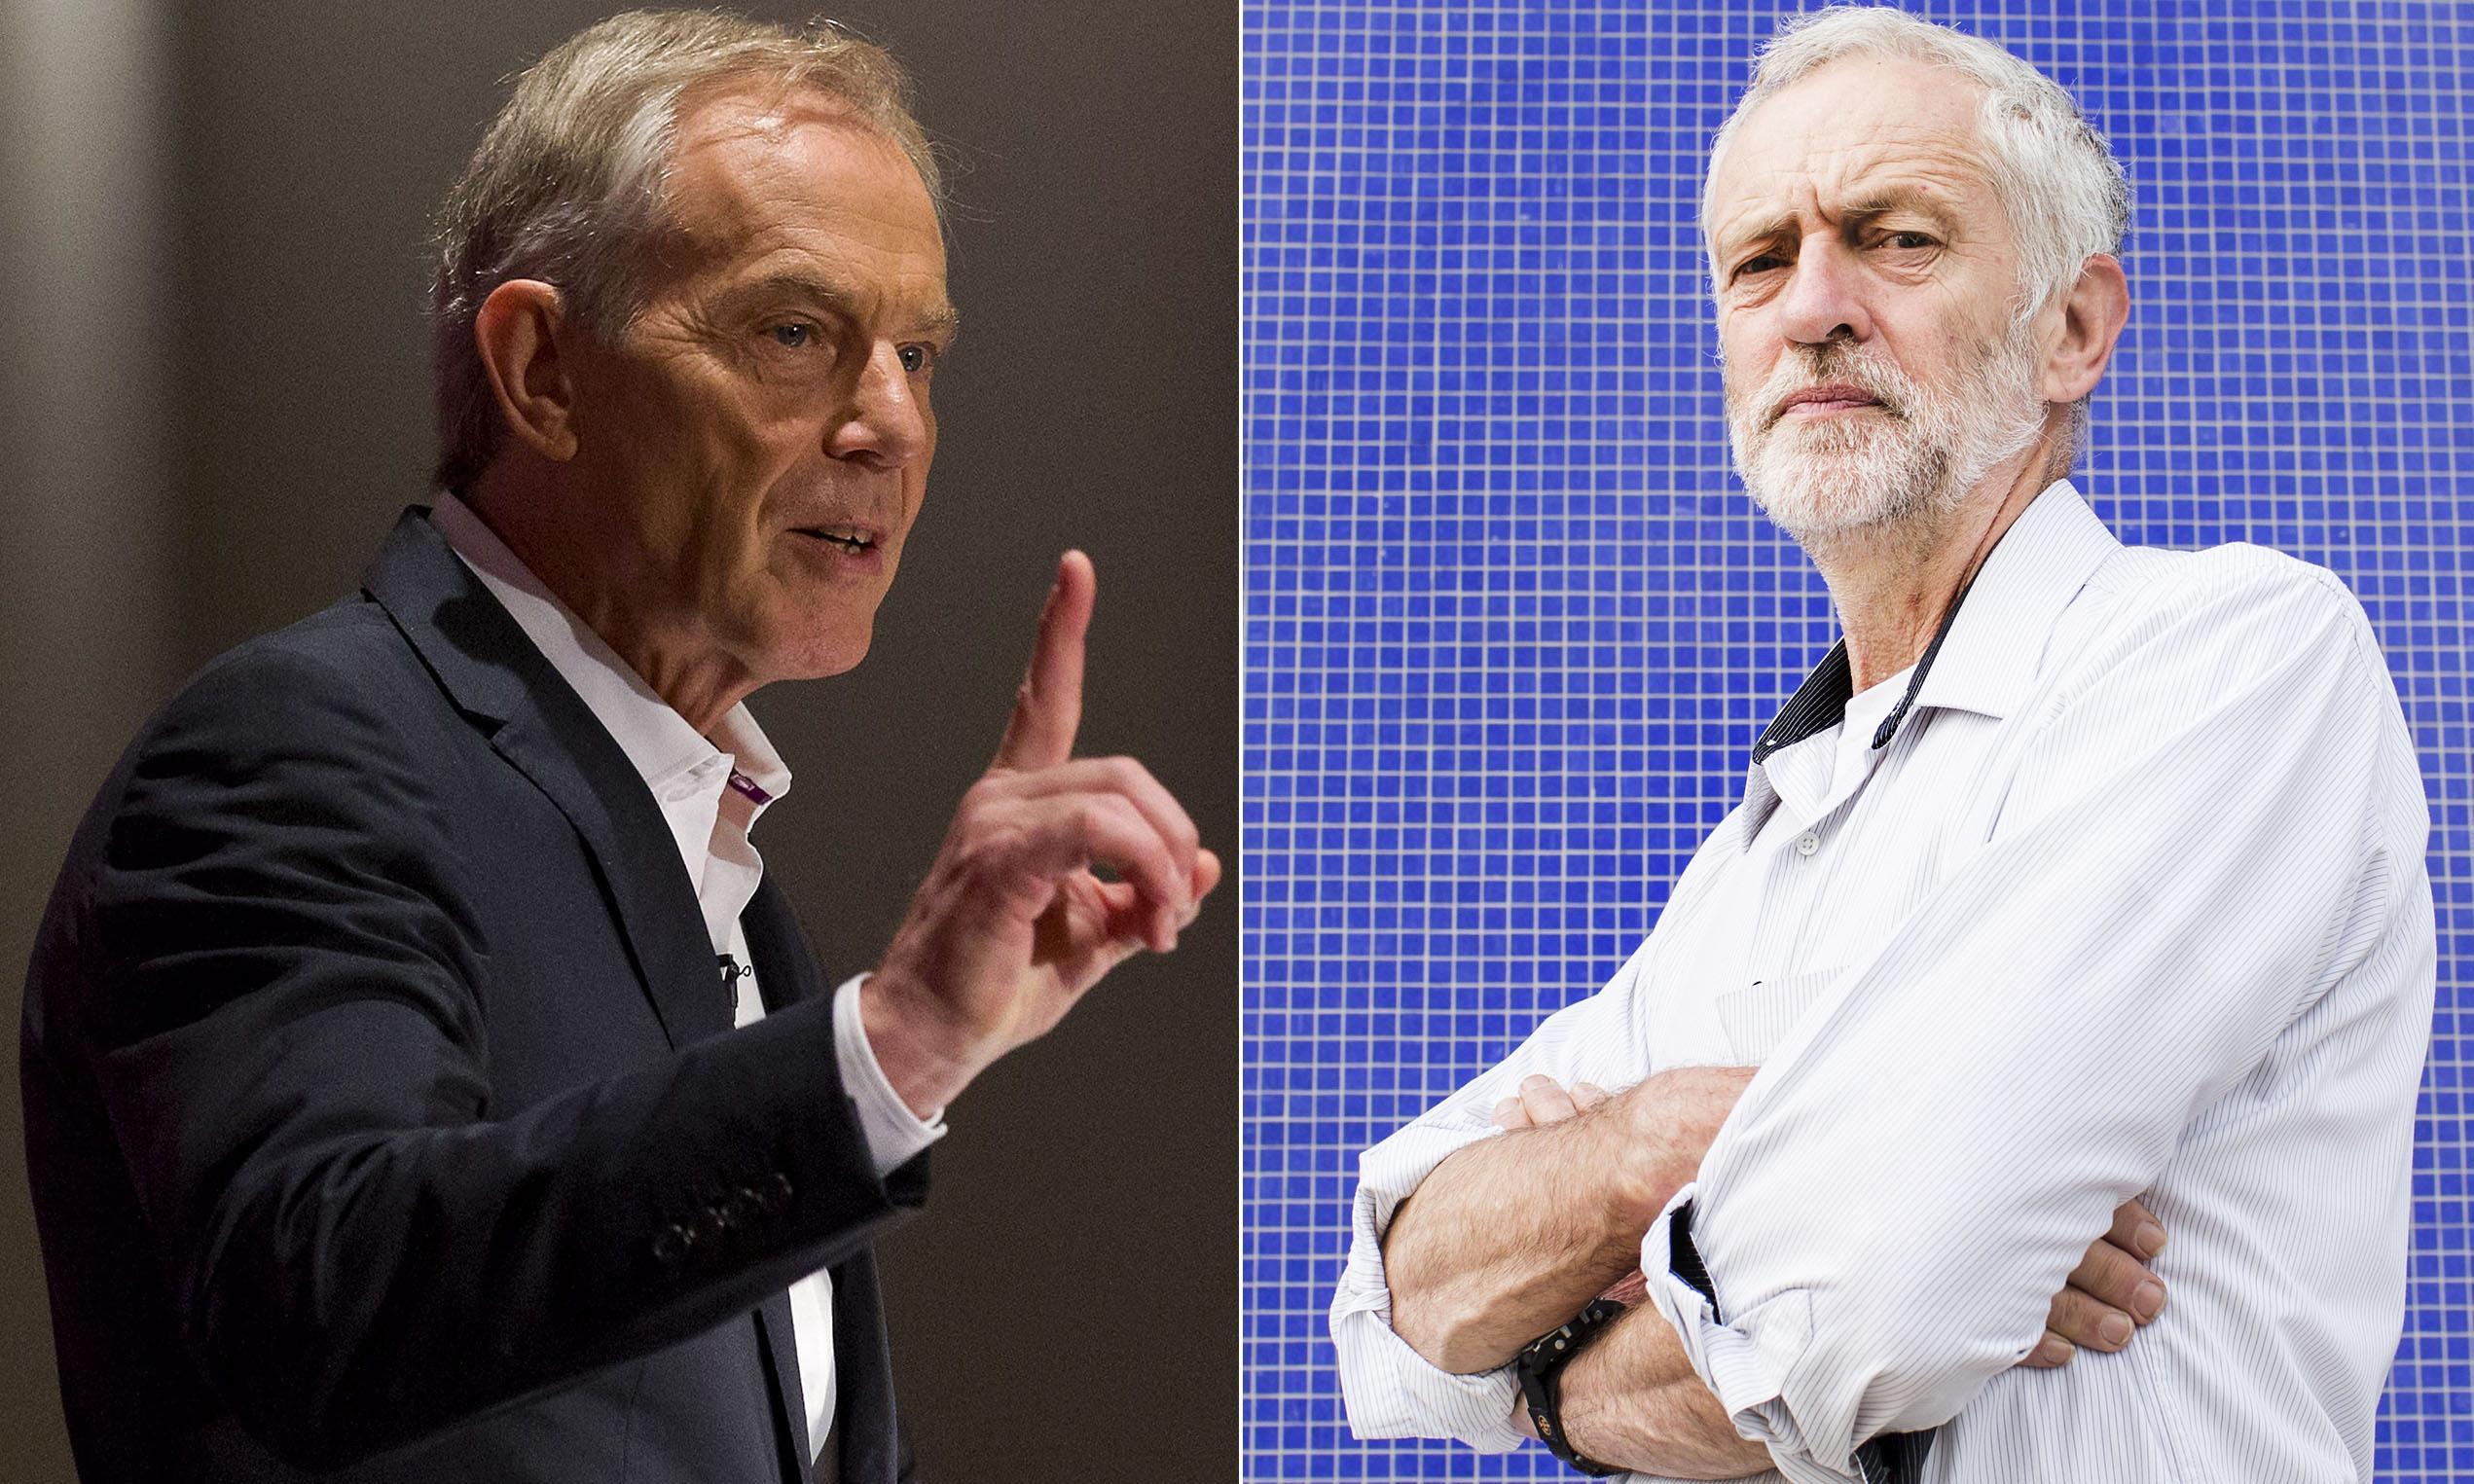 Tony Blair: Labour faces 'annihilation' if Jeremy Corbyn wins leadership